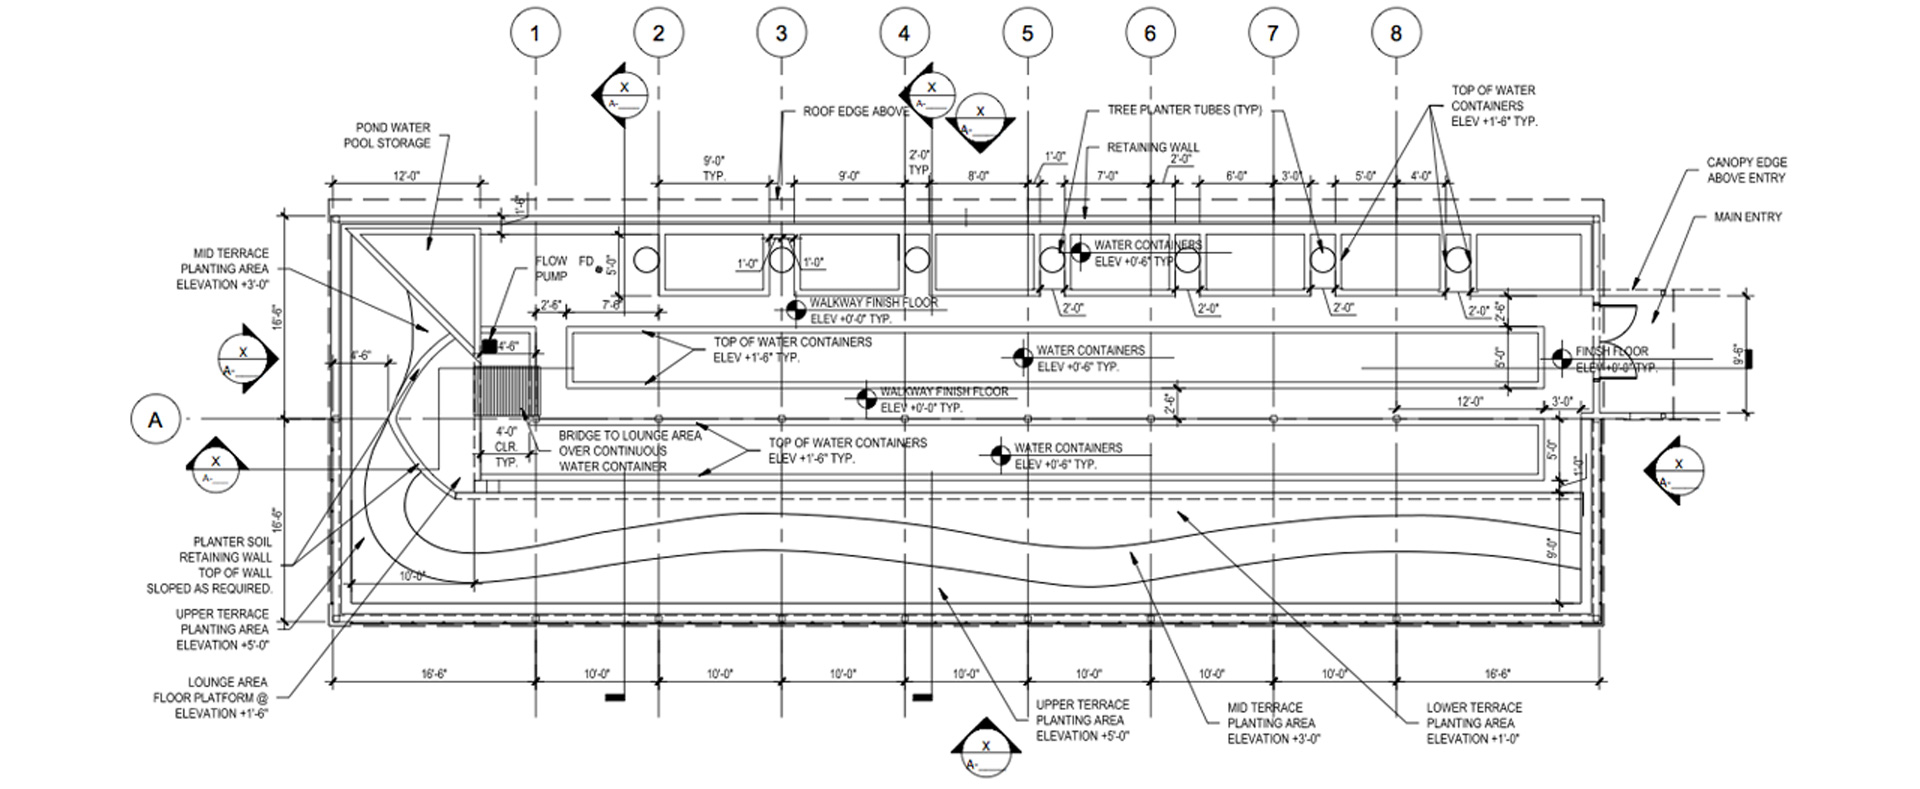 Large-scale Aquapini CAD Export